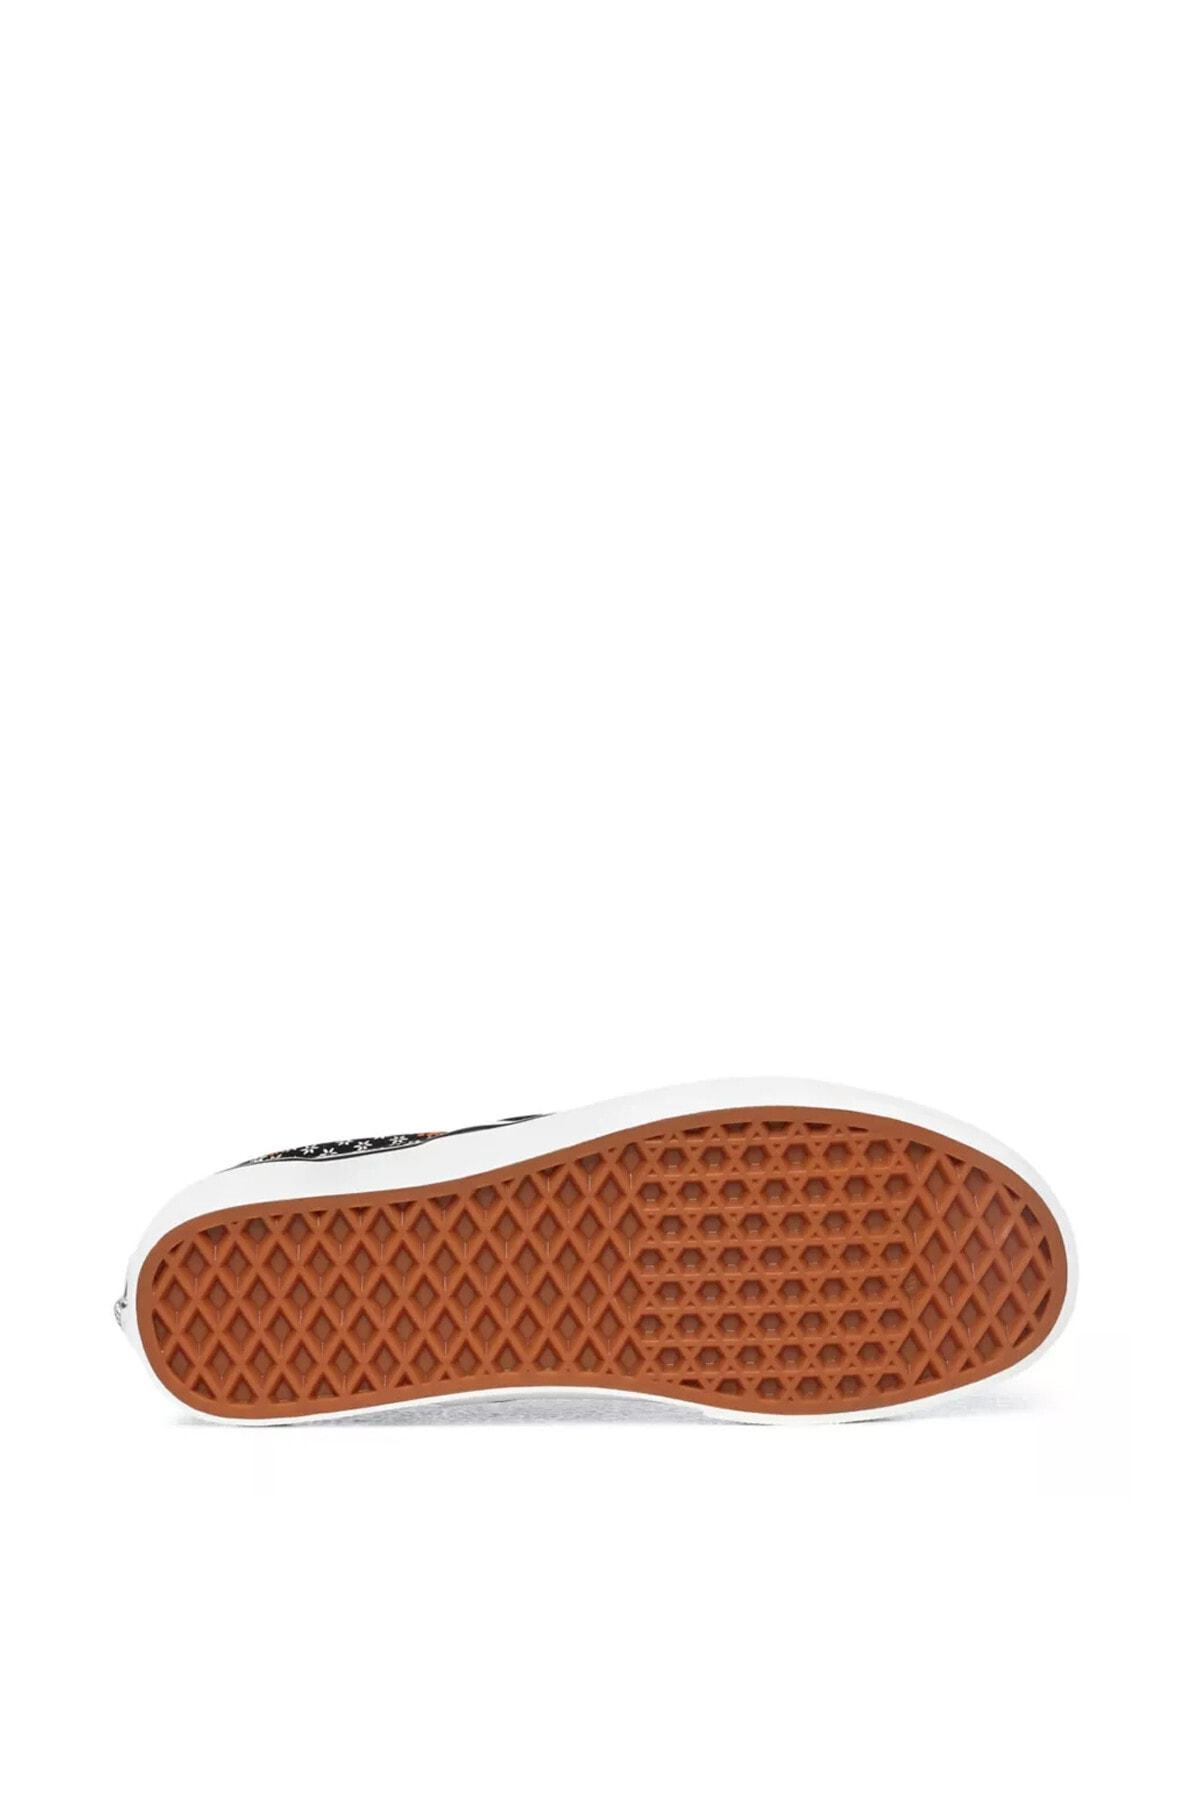 Vans Tiger Floral Classic Slip-on Kadın Ayakkabısı Vn0a4u3819m1 2